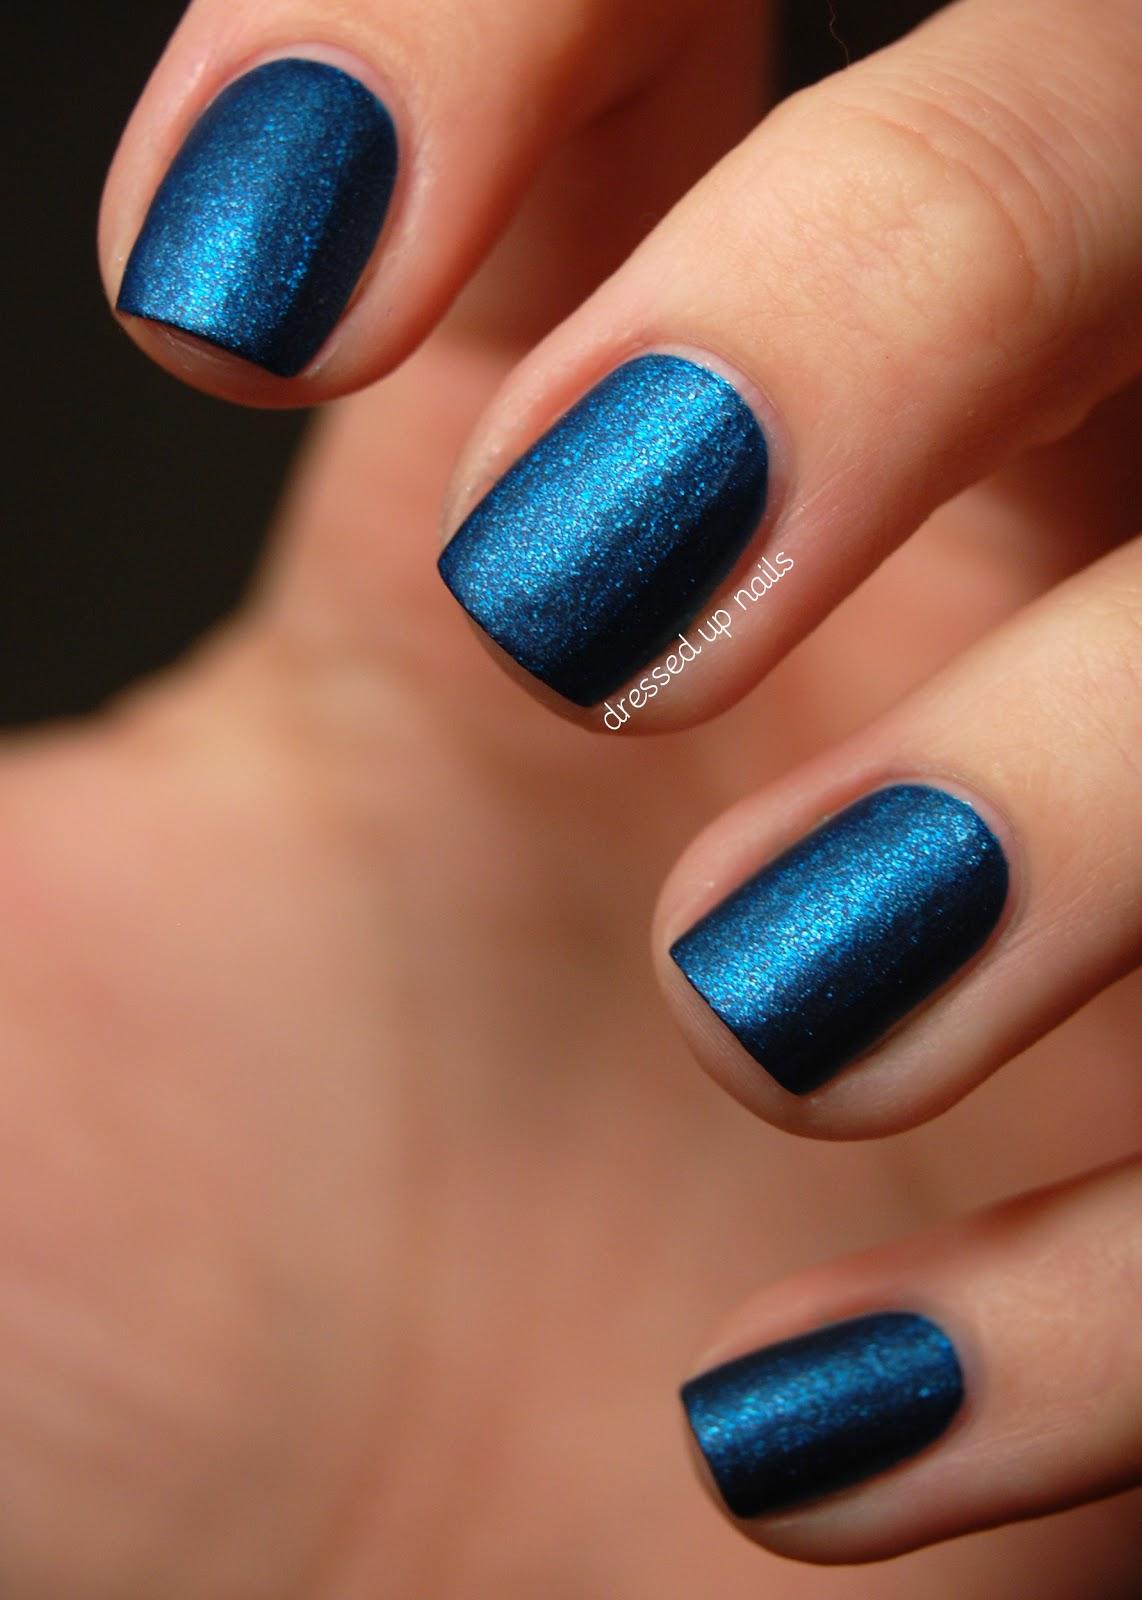 Nail Polish Blues Blue Velvet/suede Polish